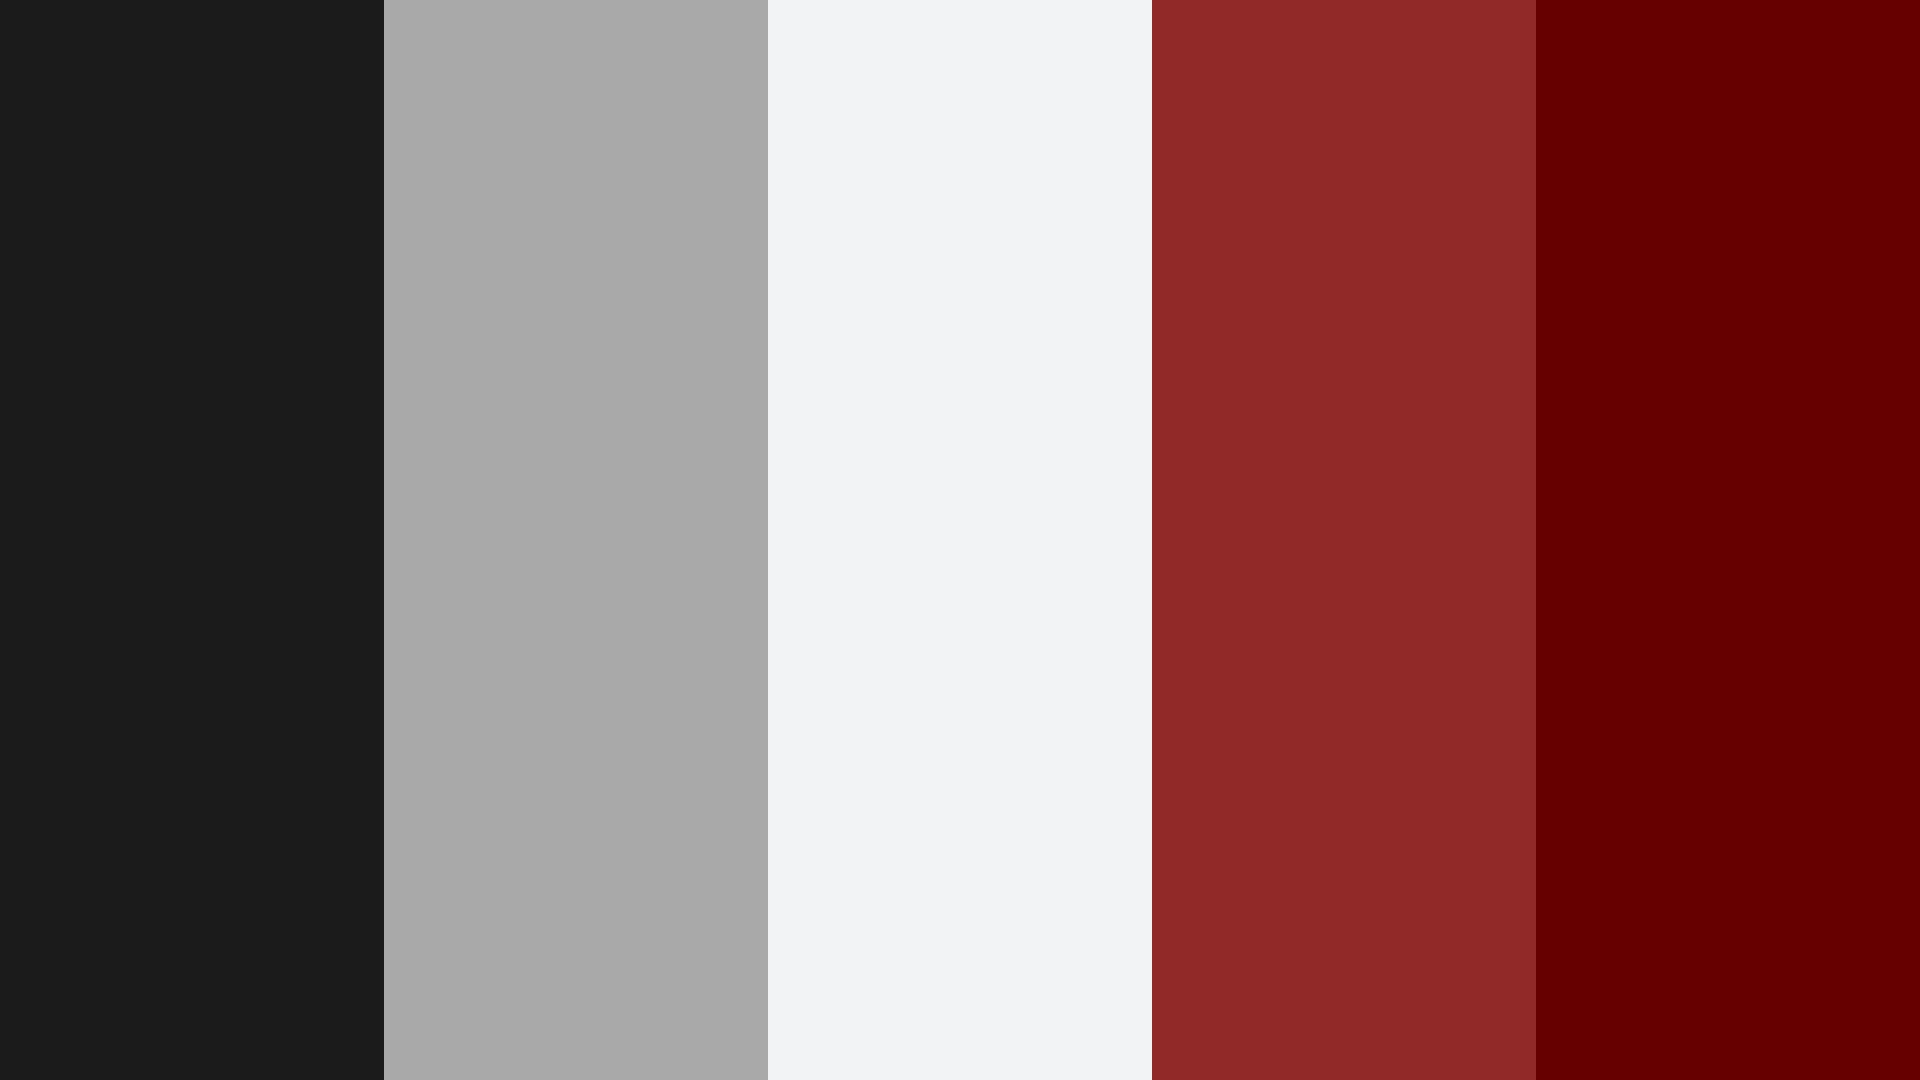 Kratos God Of War Color Scheme Black Schemecolor Com